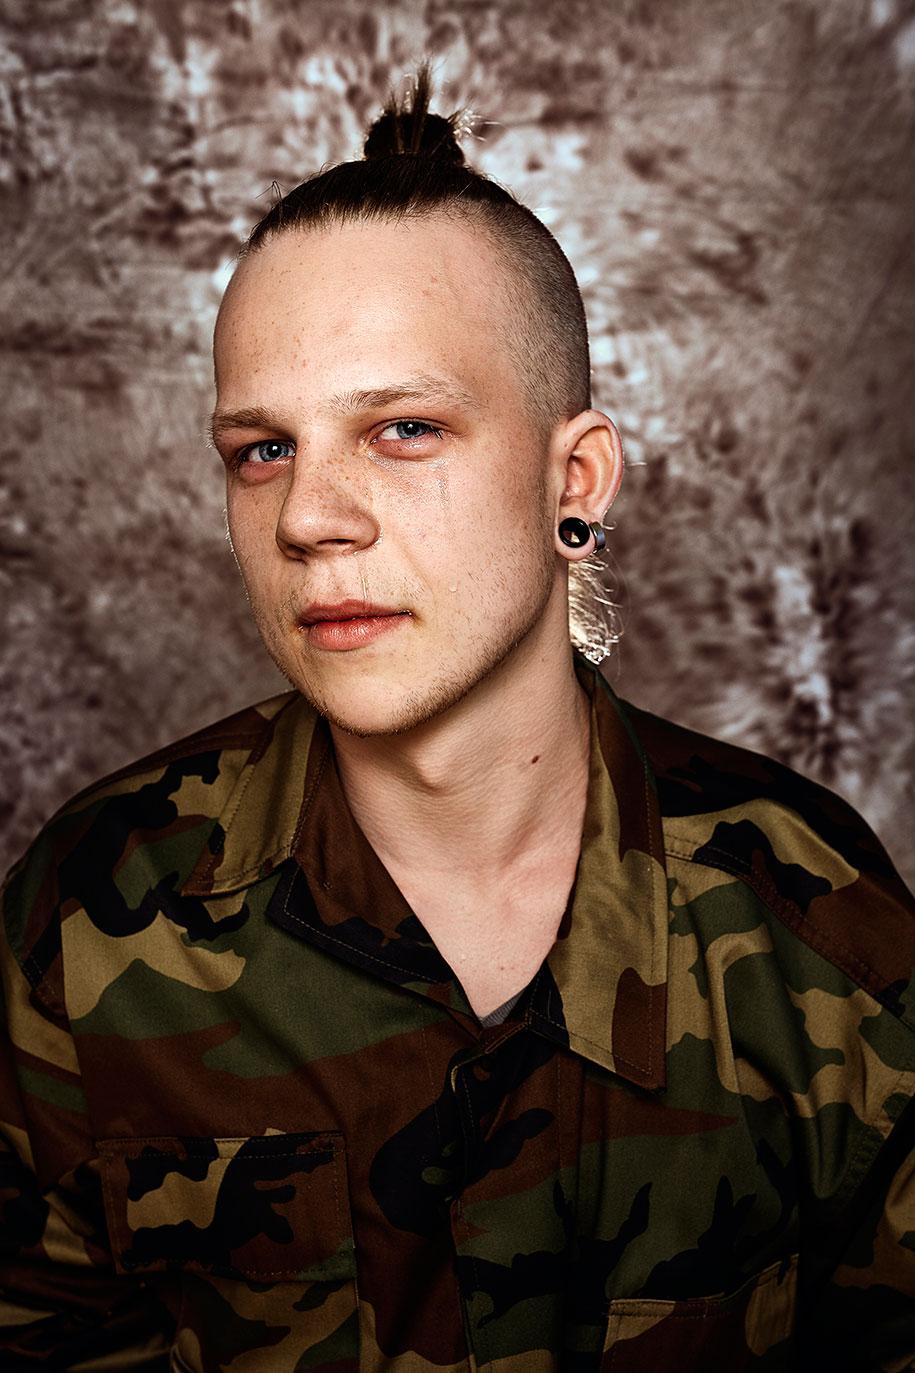 lithuanian-draft-conscription-men-portraits-neringa-rekasiute-beata-tiskevic-hasanova-7